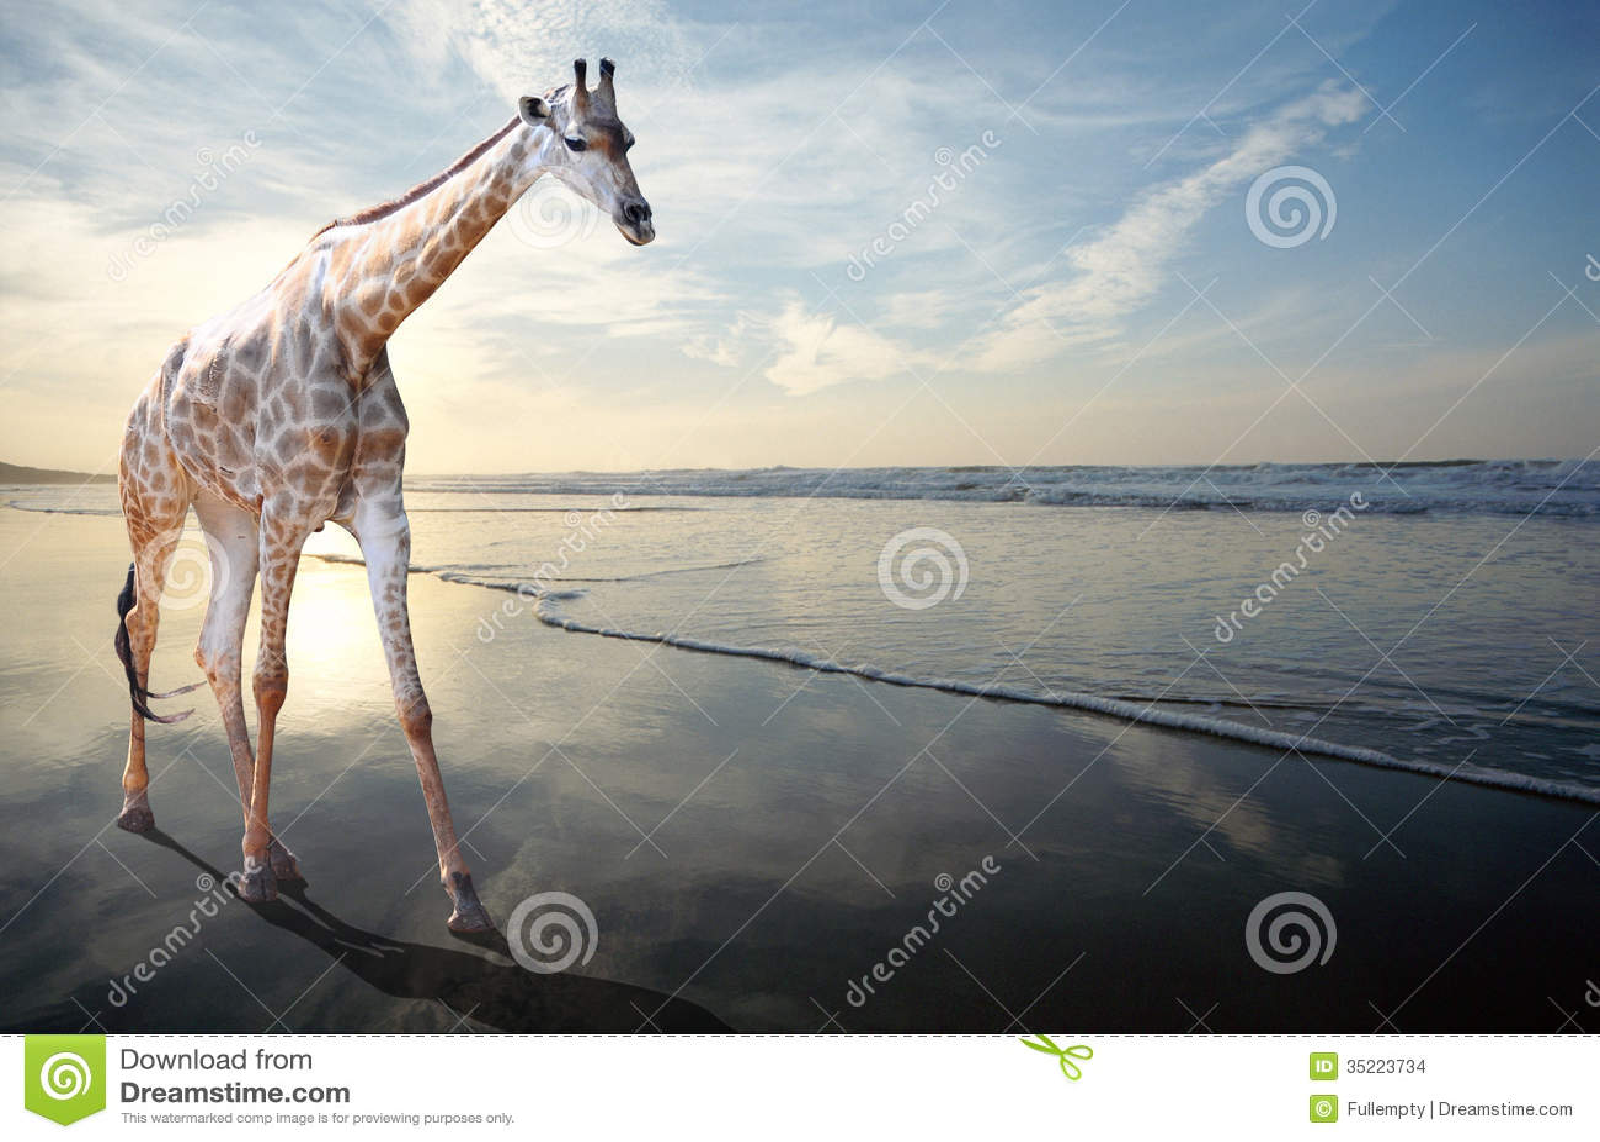 Dream of a giraffe walking on sandy beach